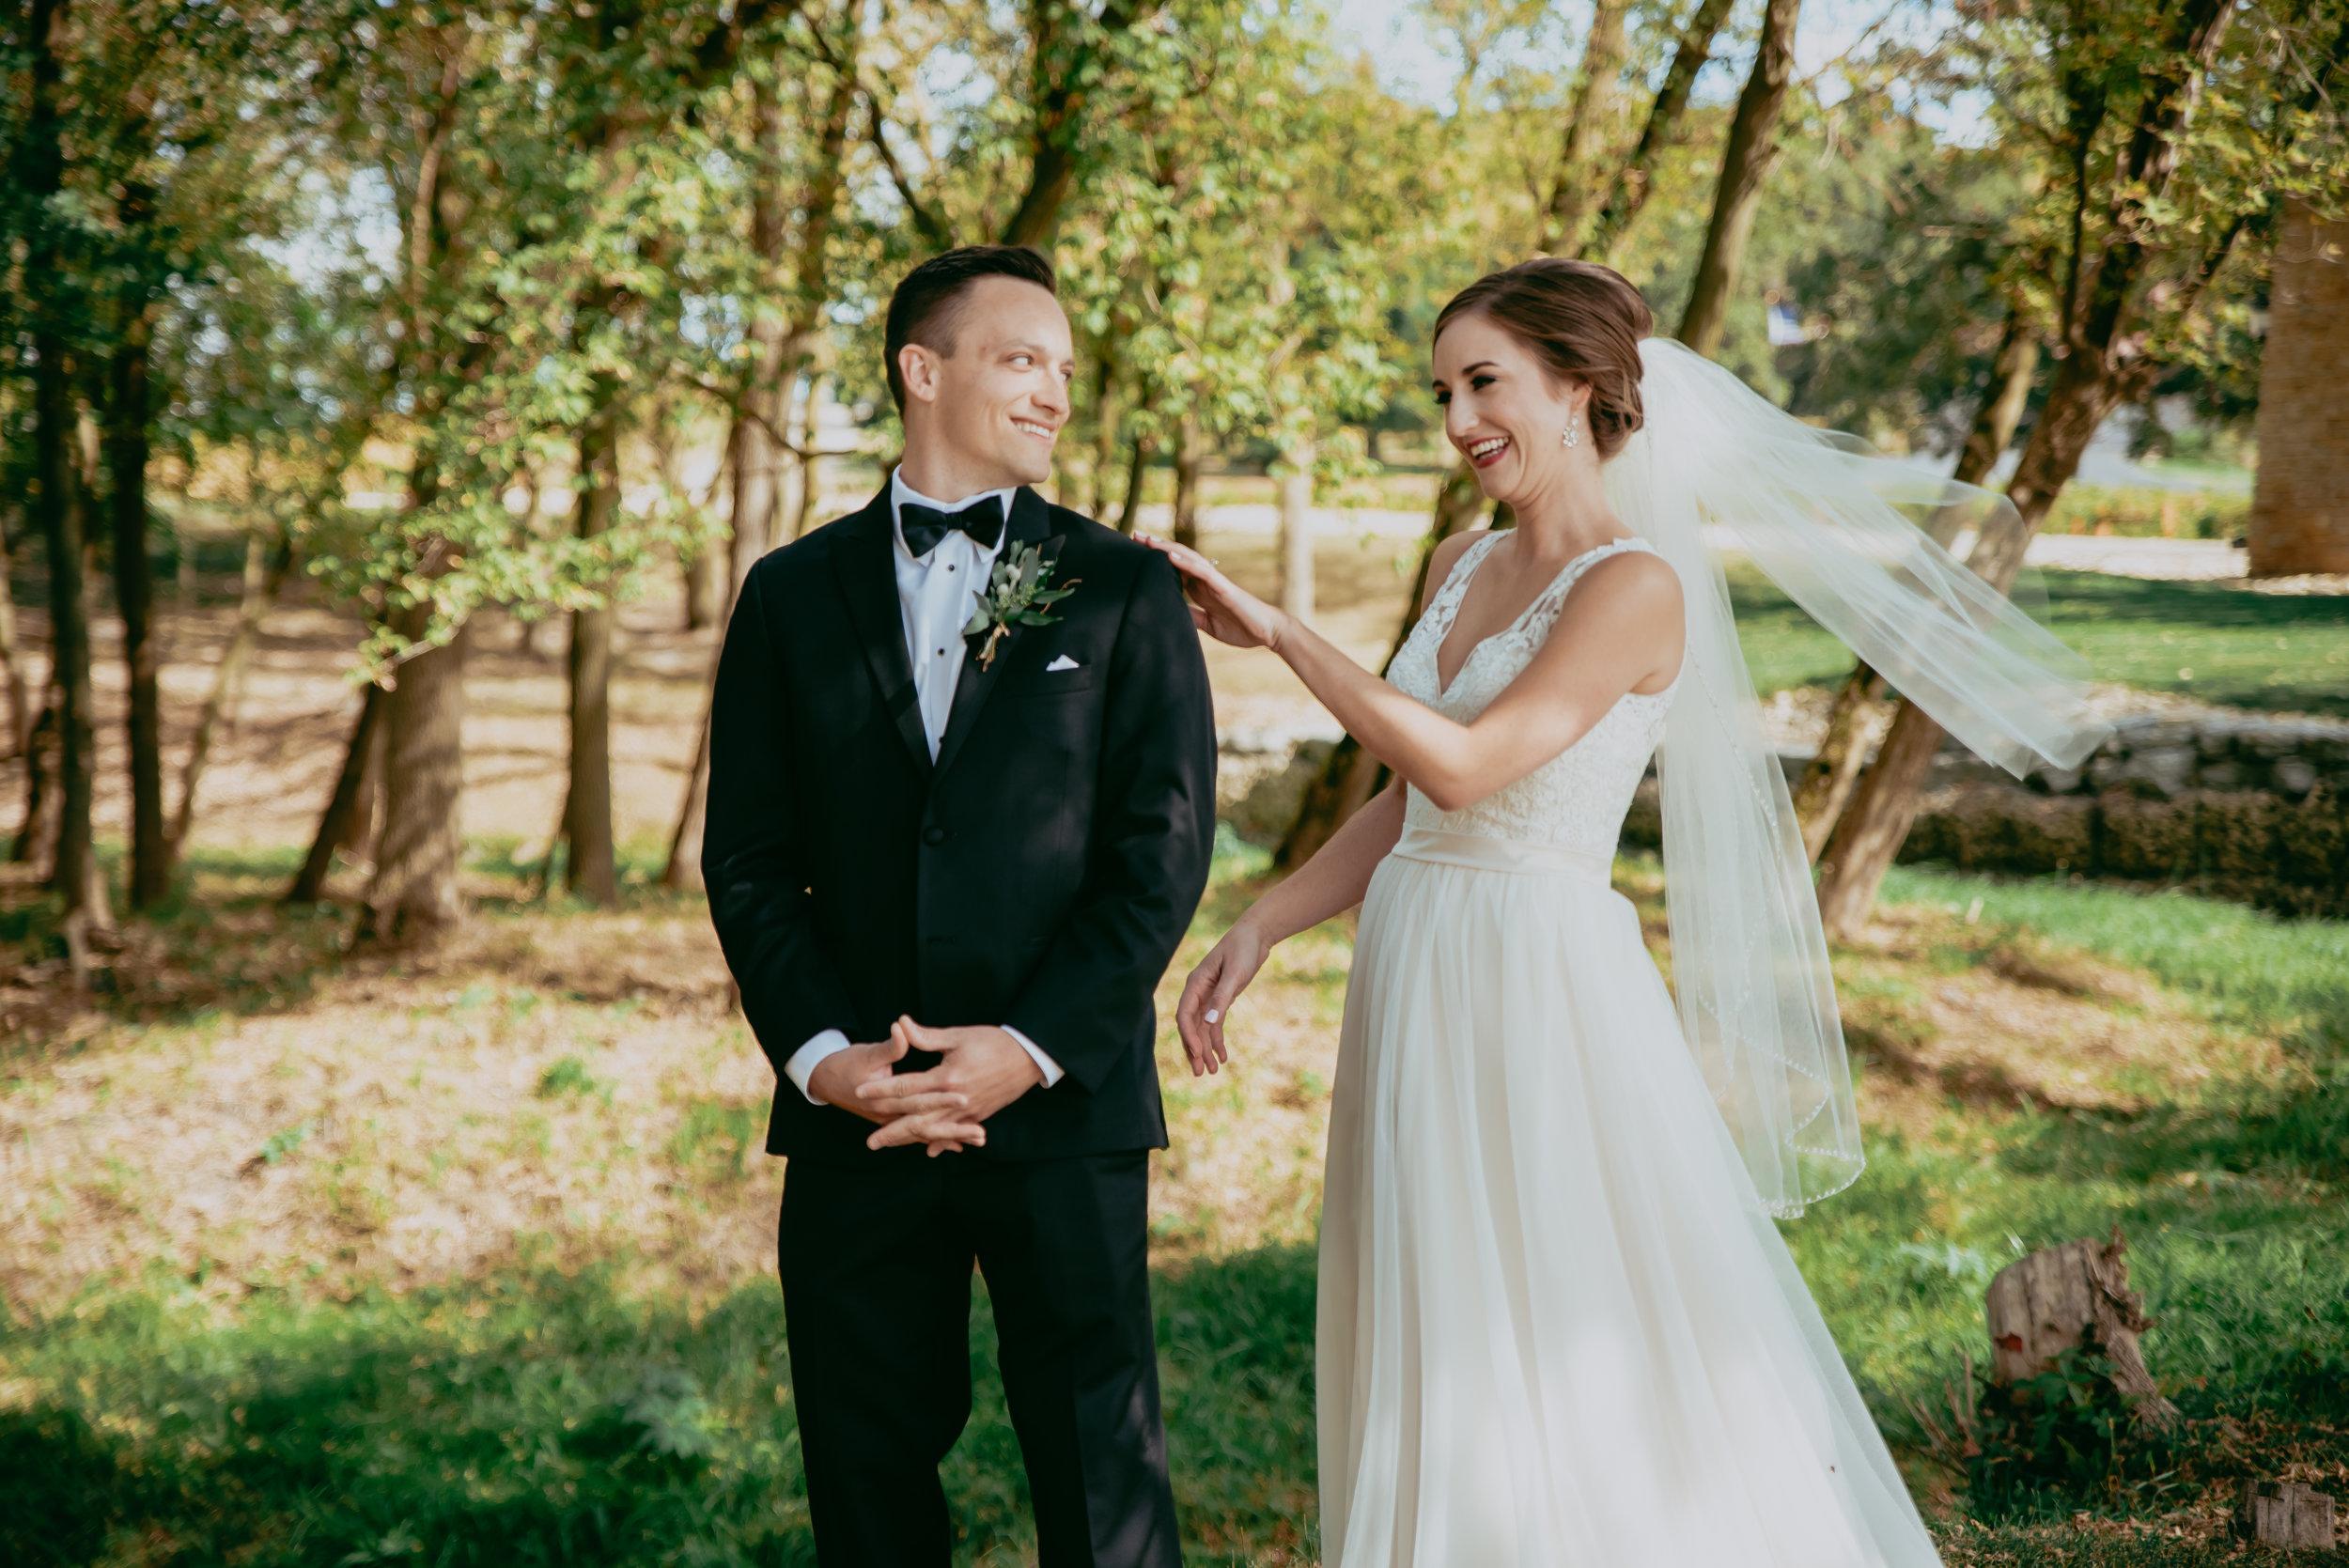 Porcelli-wedding-290.jpg